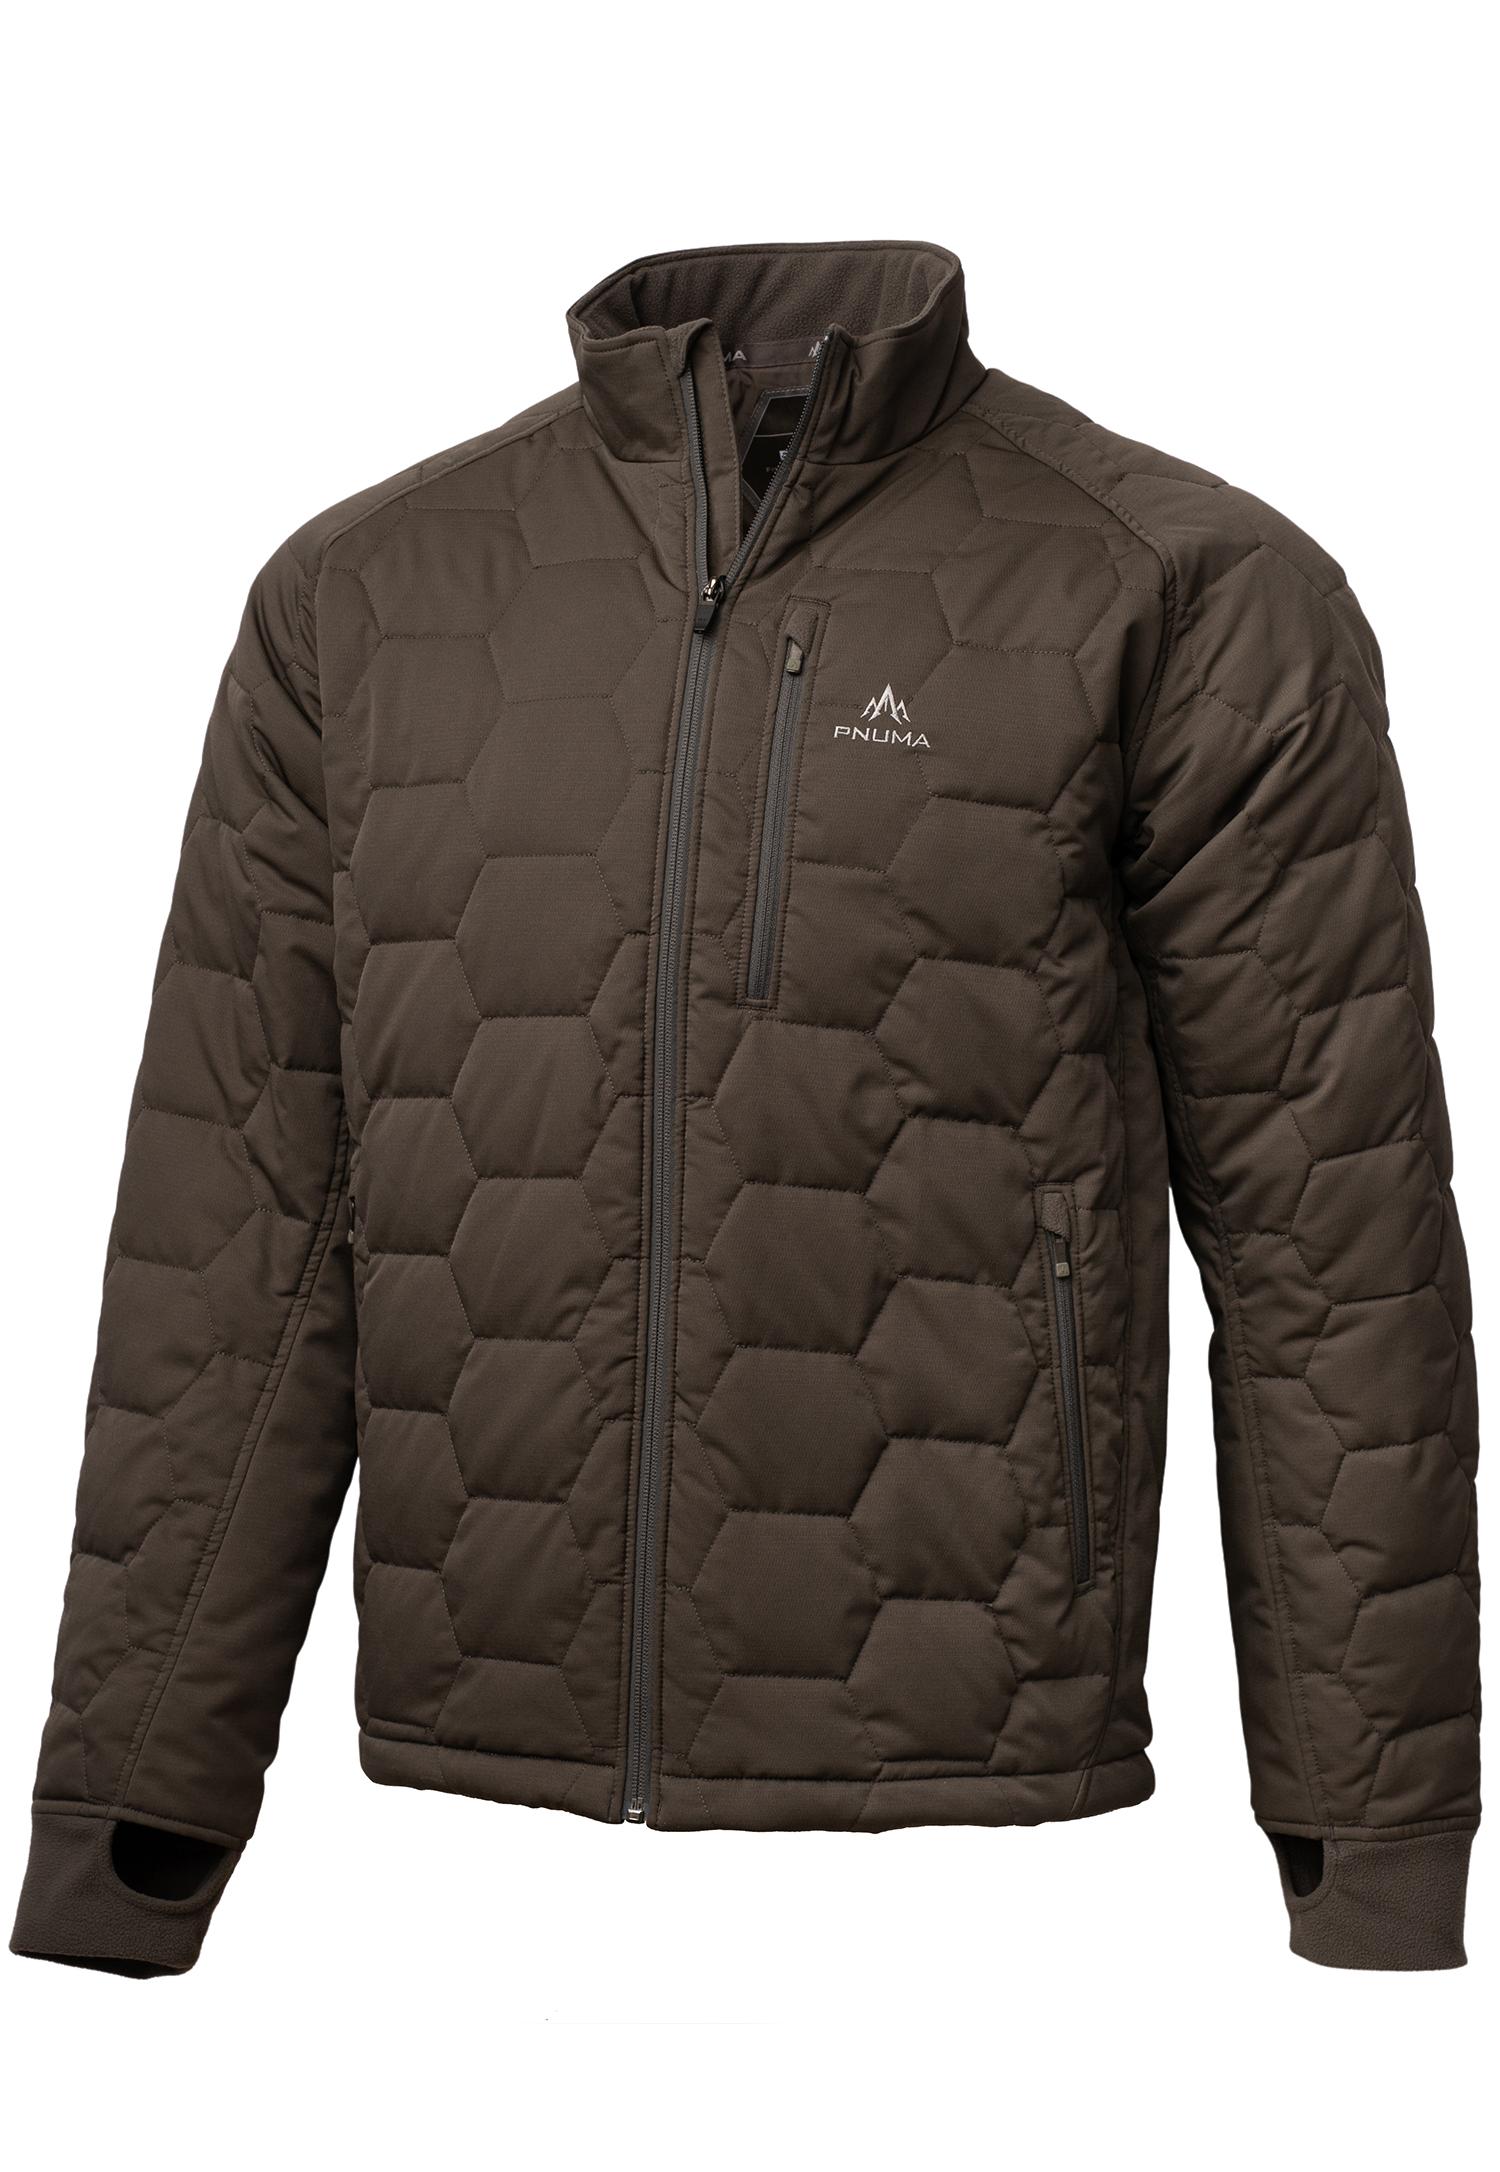 Insulator Jacket - Solid